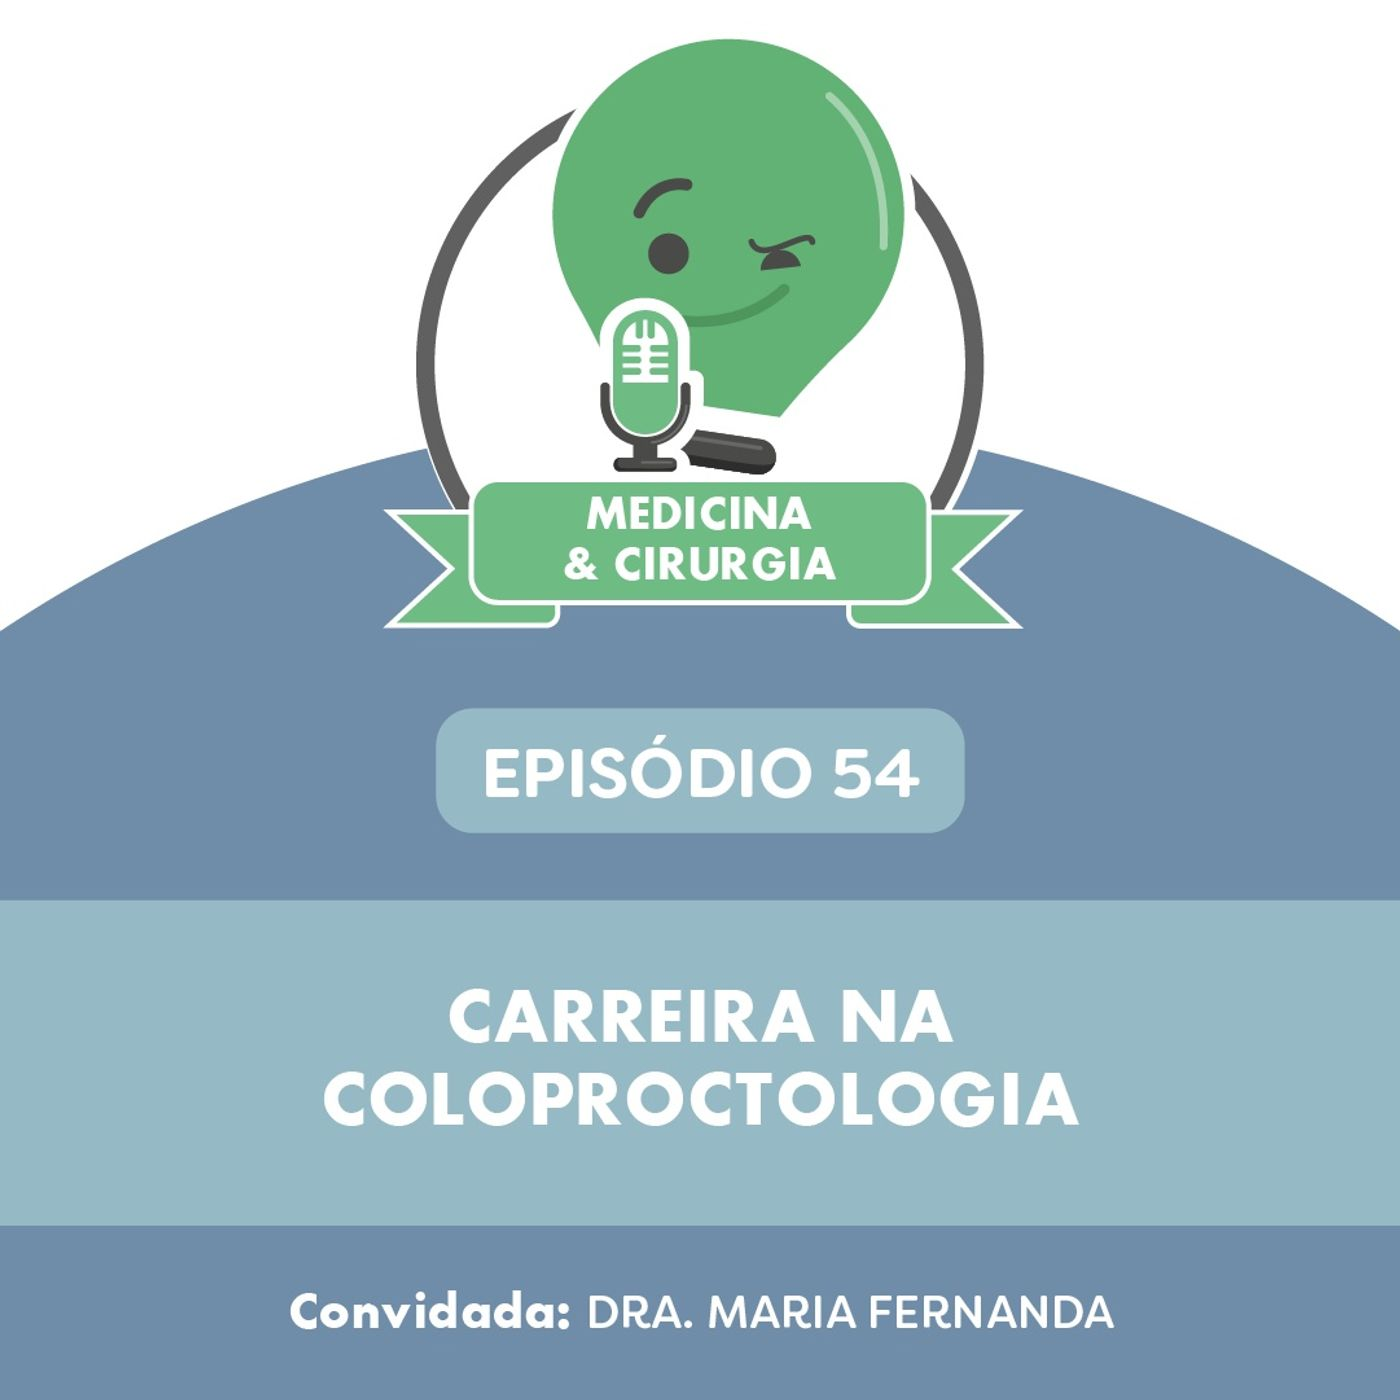 54 - Carreira na coloproctologia